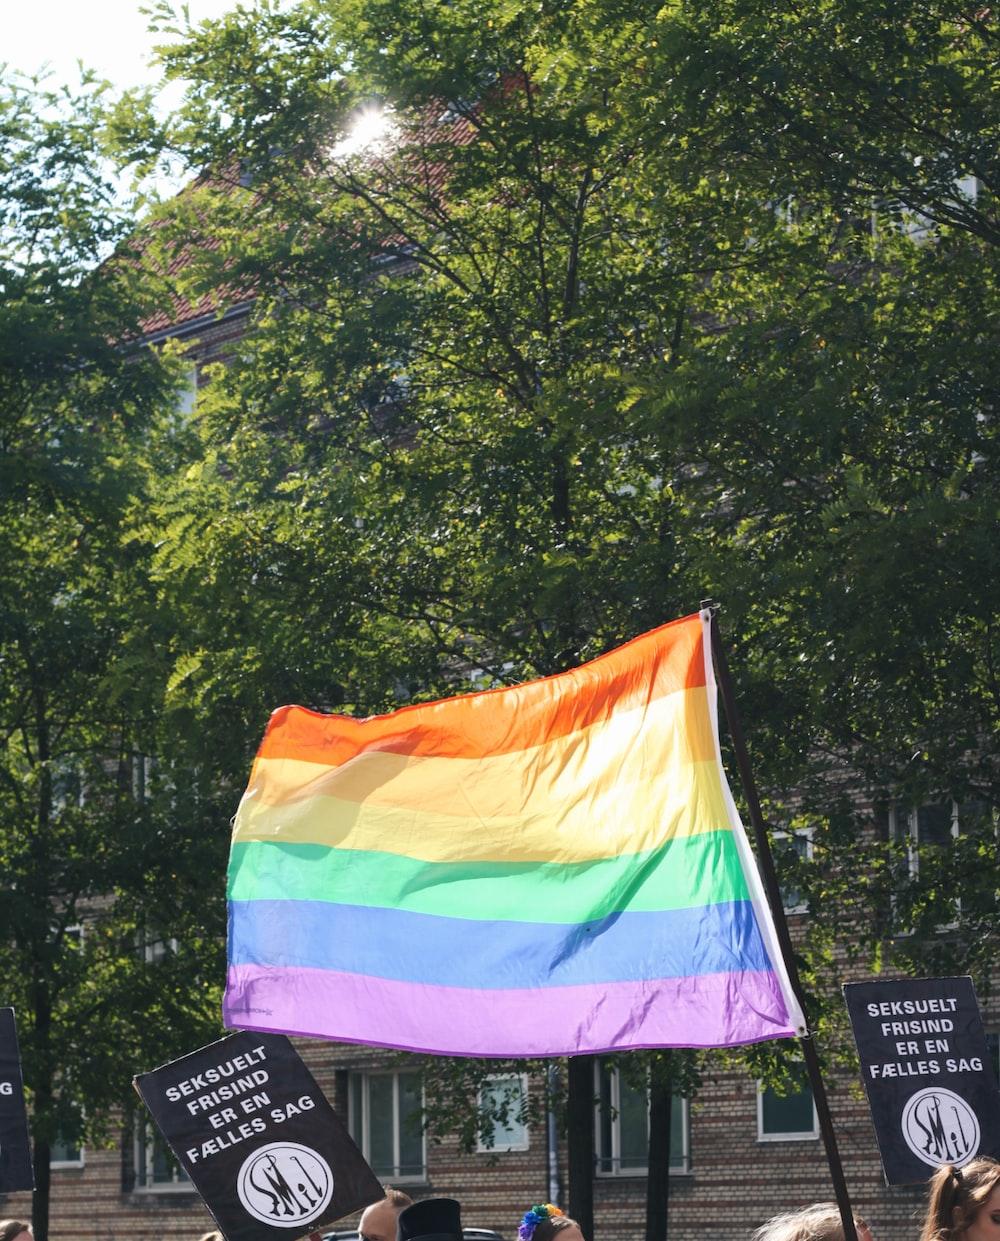 rainbow flag on pole near trees during daytime